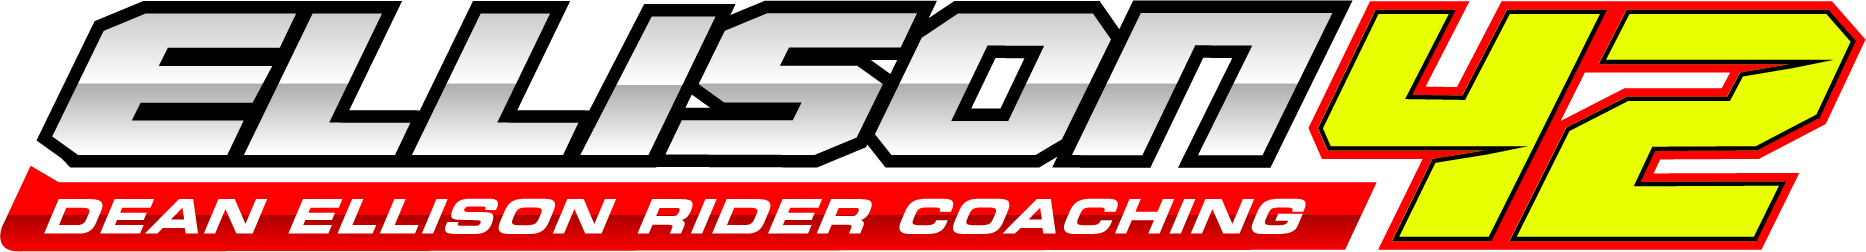 Ellison42 - Dean Ellison Rider Coaching